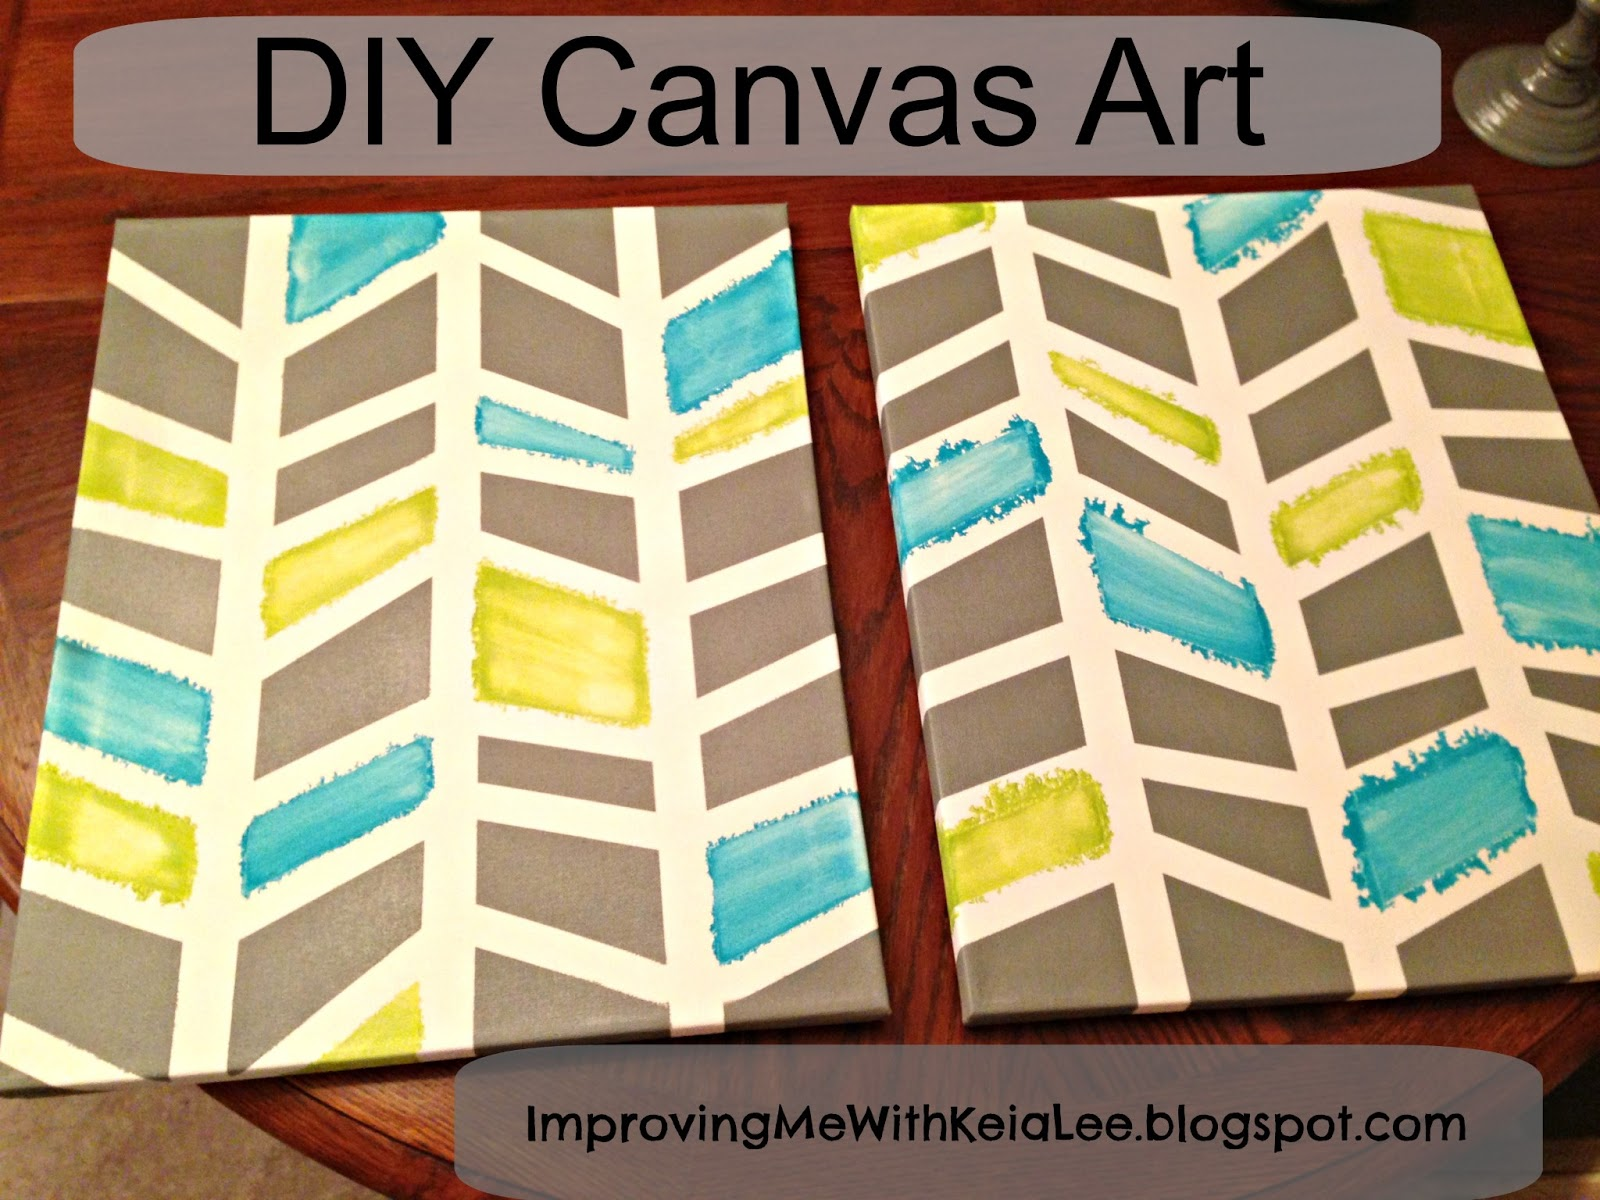 Blue Canvas Art Diy: Improving Me: DIY Canvas Art Project